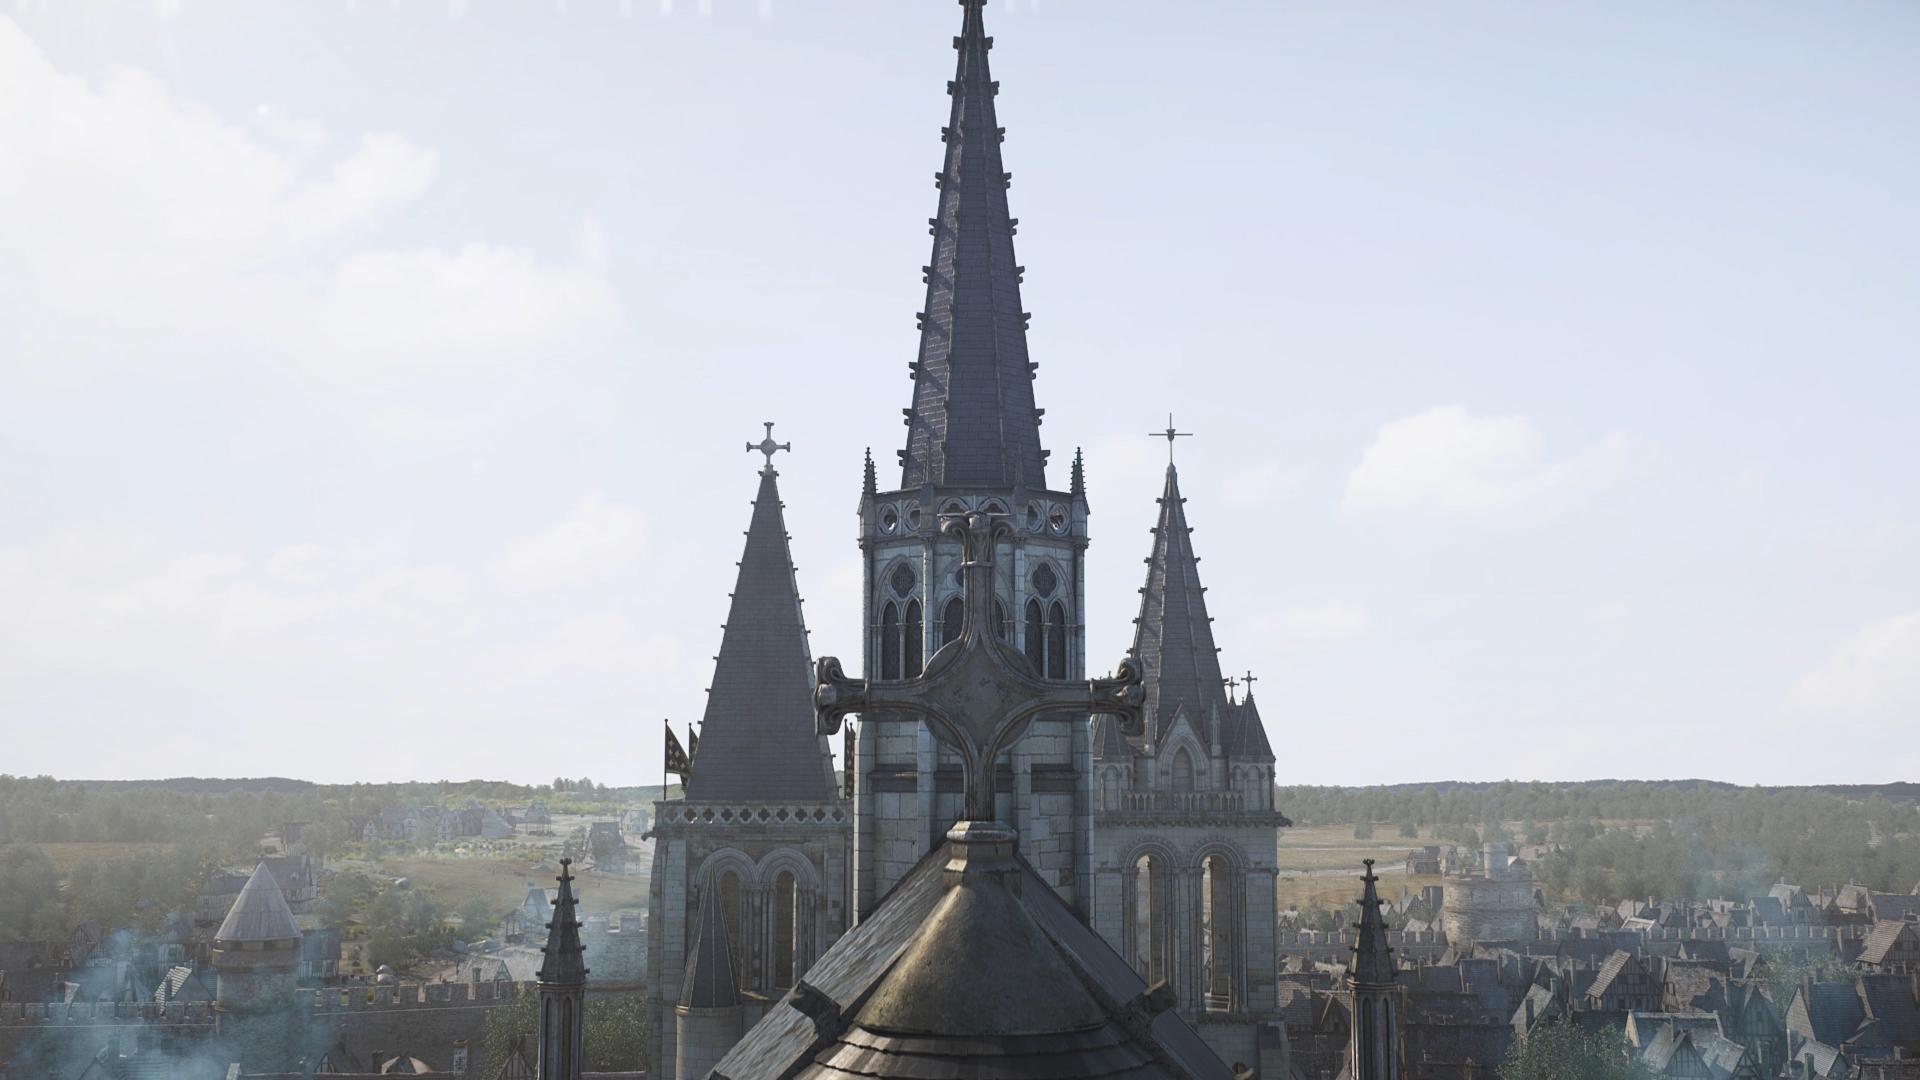 GALERIE-Dripmoon-Studio 3D-Tours-Reconstitution-Patrimoine-REVIS MARTIN (52) copie